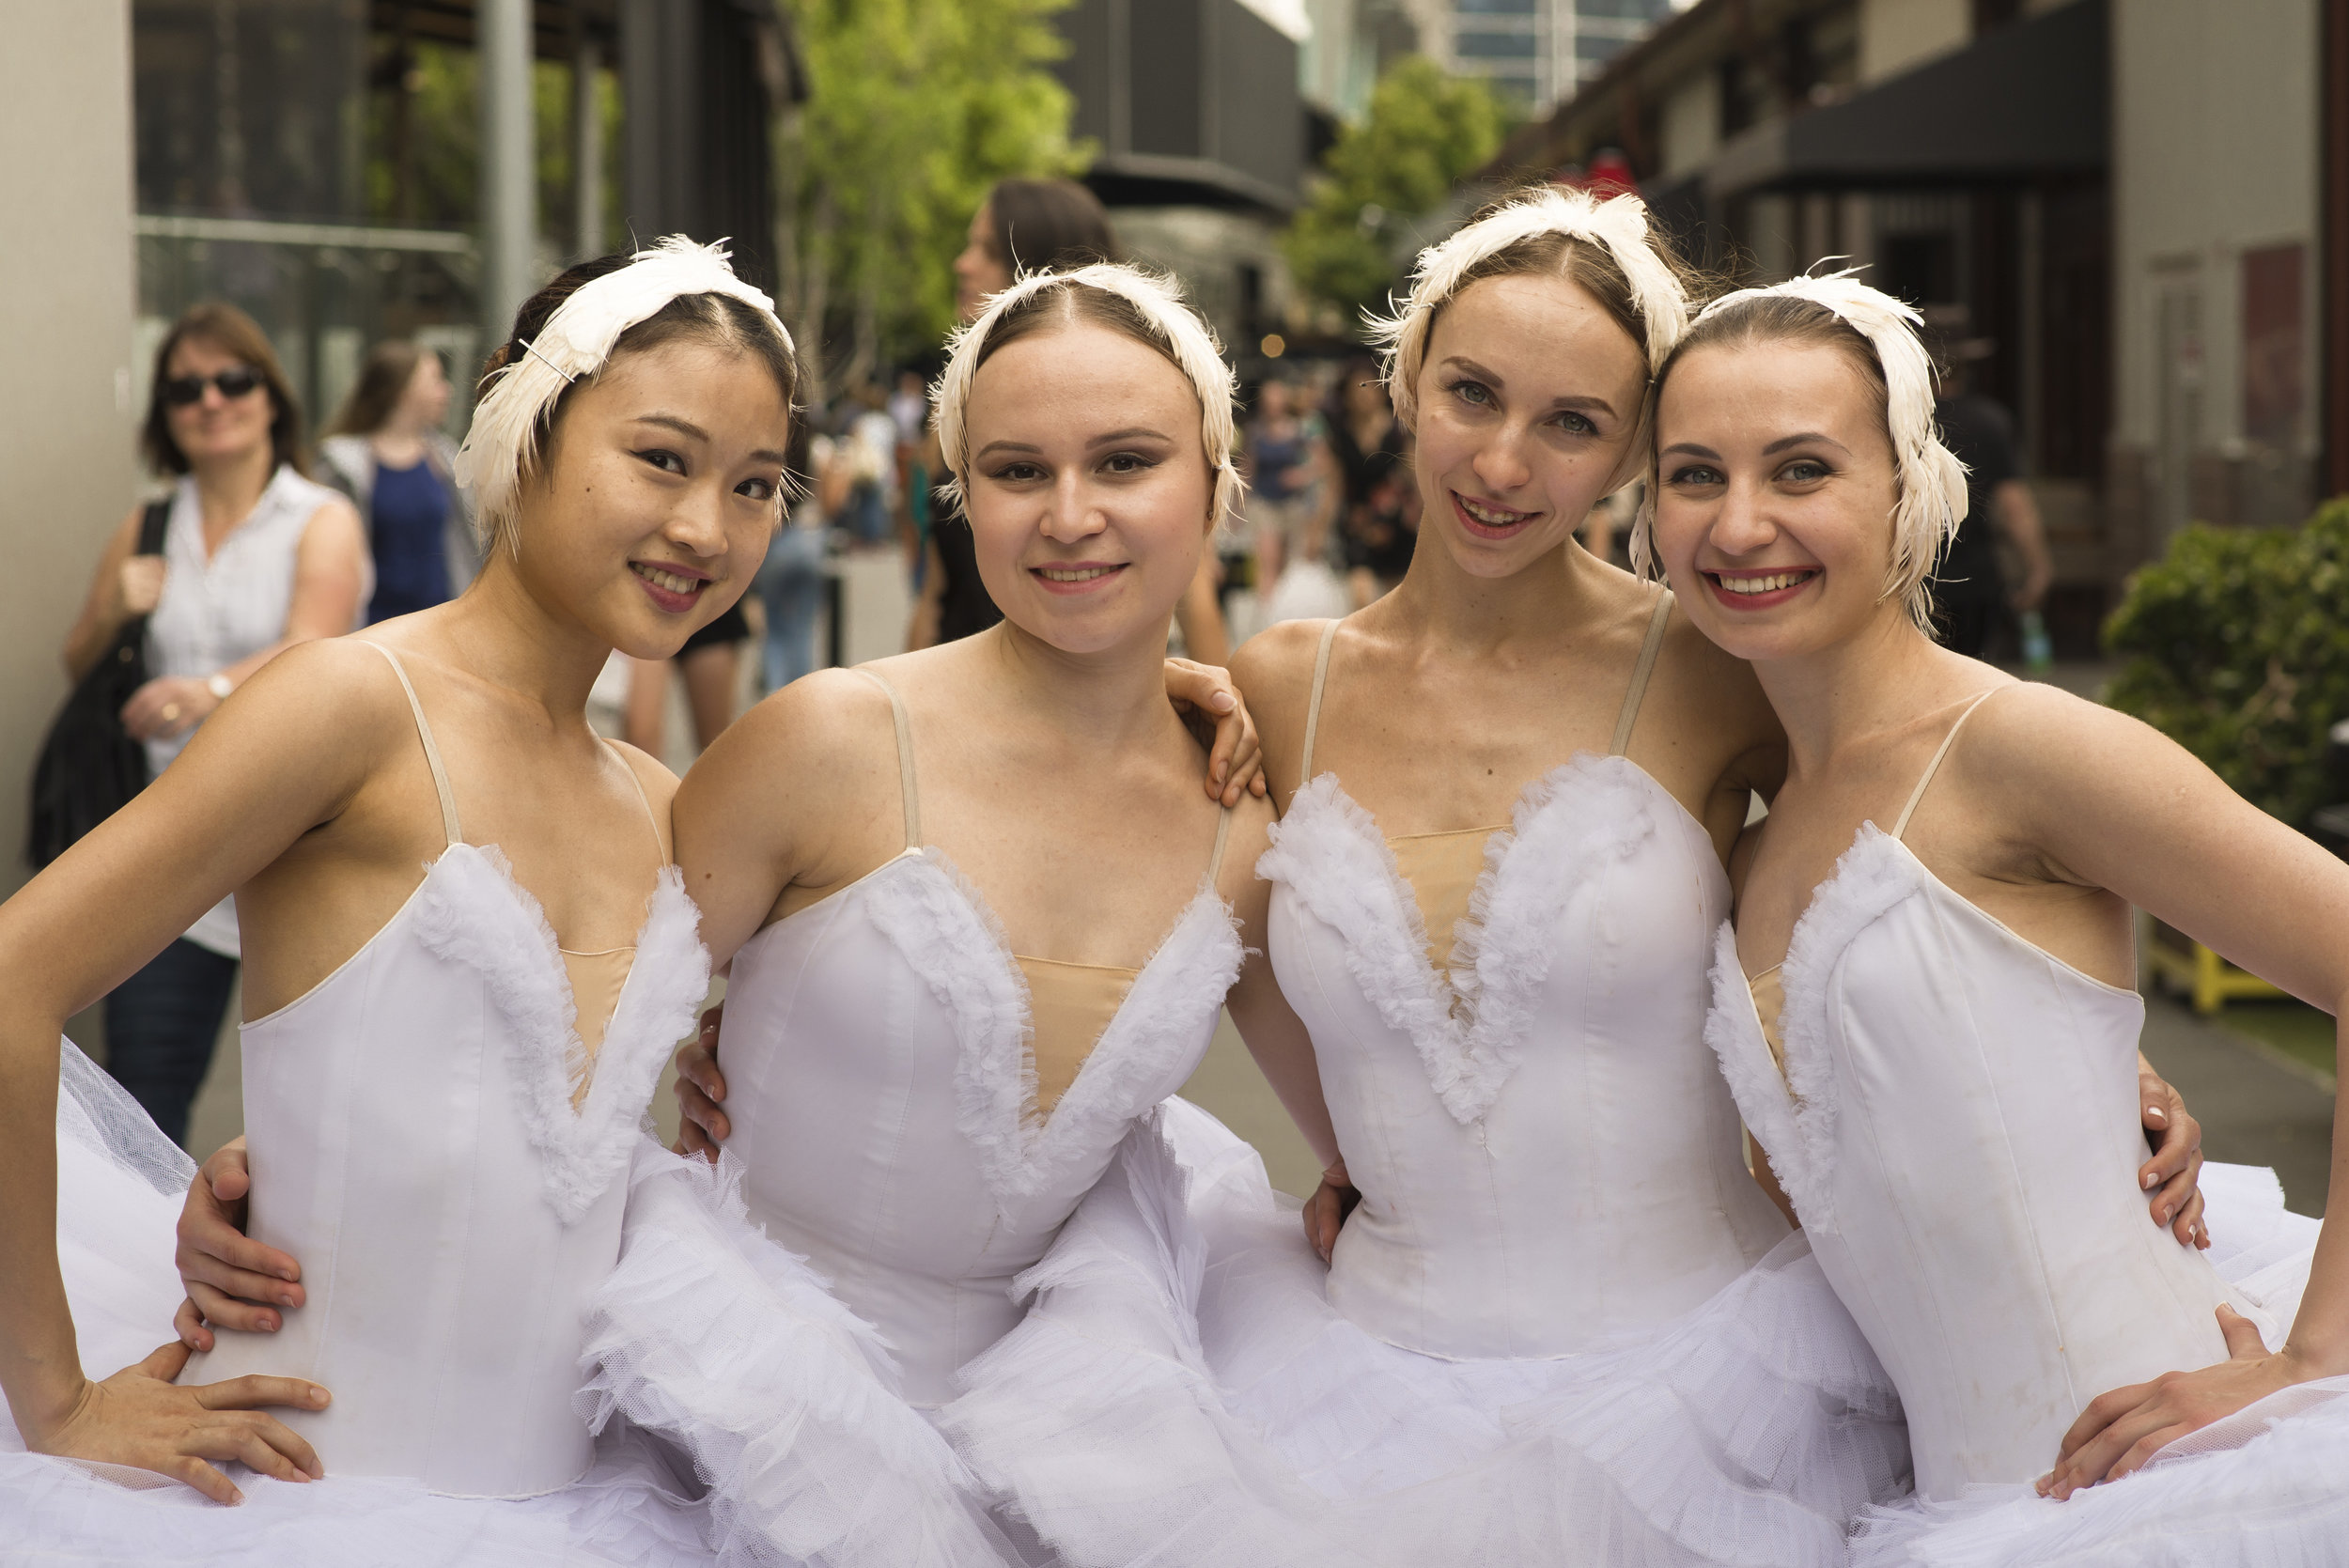 The Girls: Arisa Hashimoto, Olga Naumova, Anastasia Chava & Valeriya Andropova